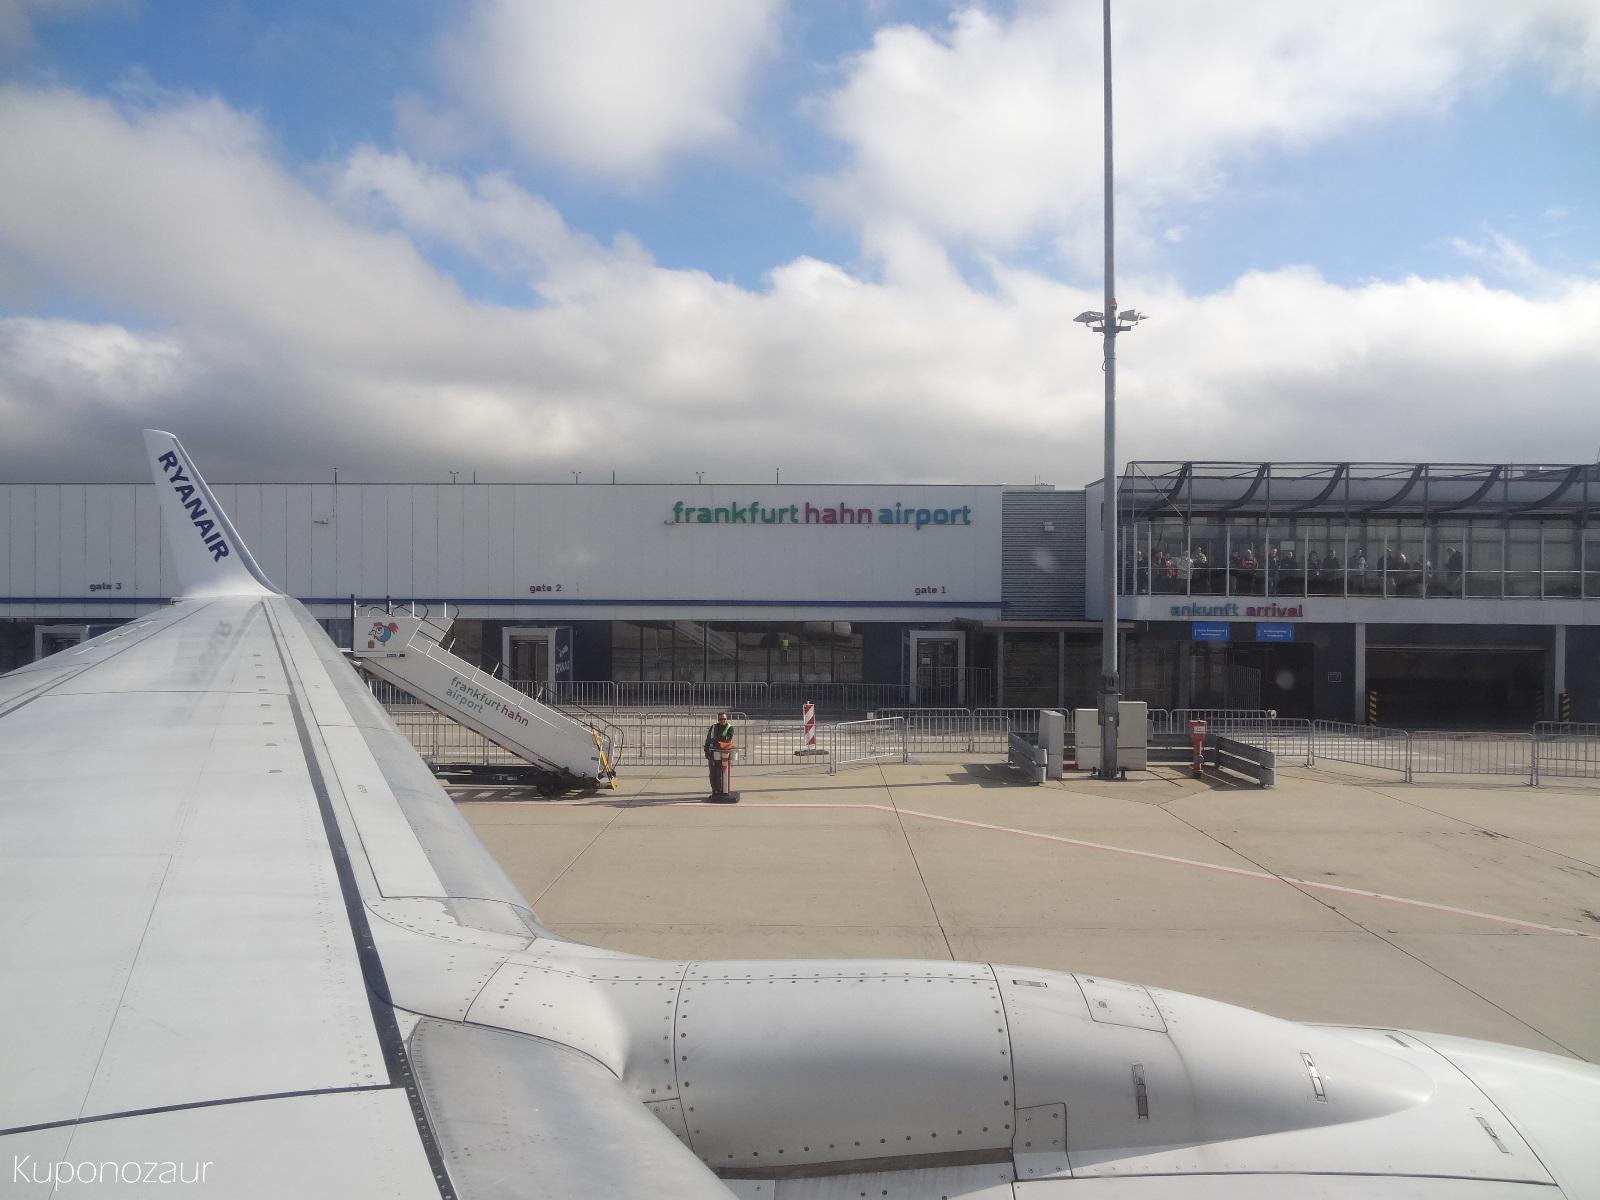 Samolot Ryanair wylądował na lotnisku Frankfurt-Hahn